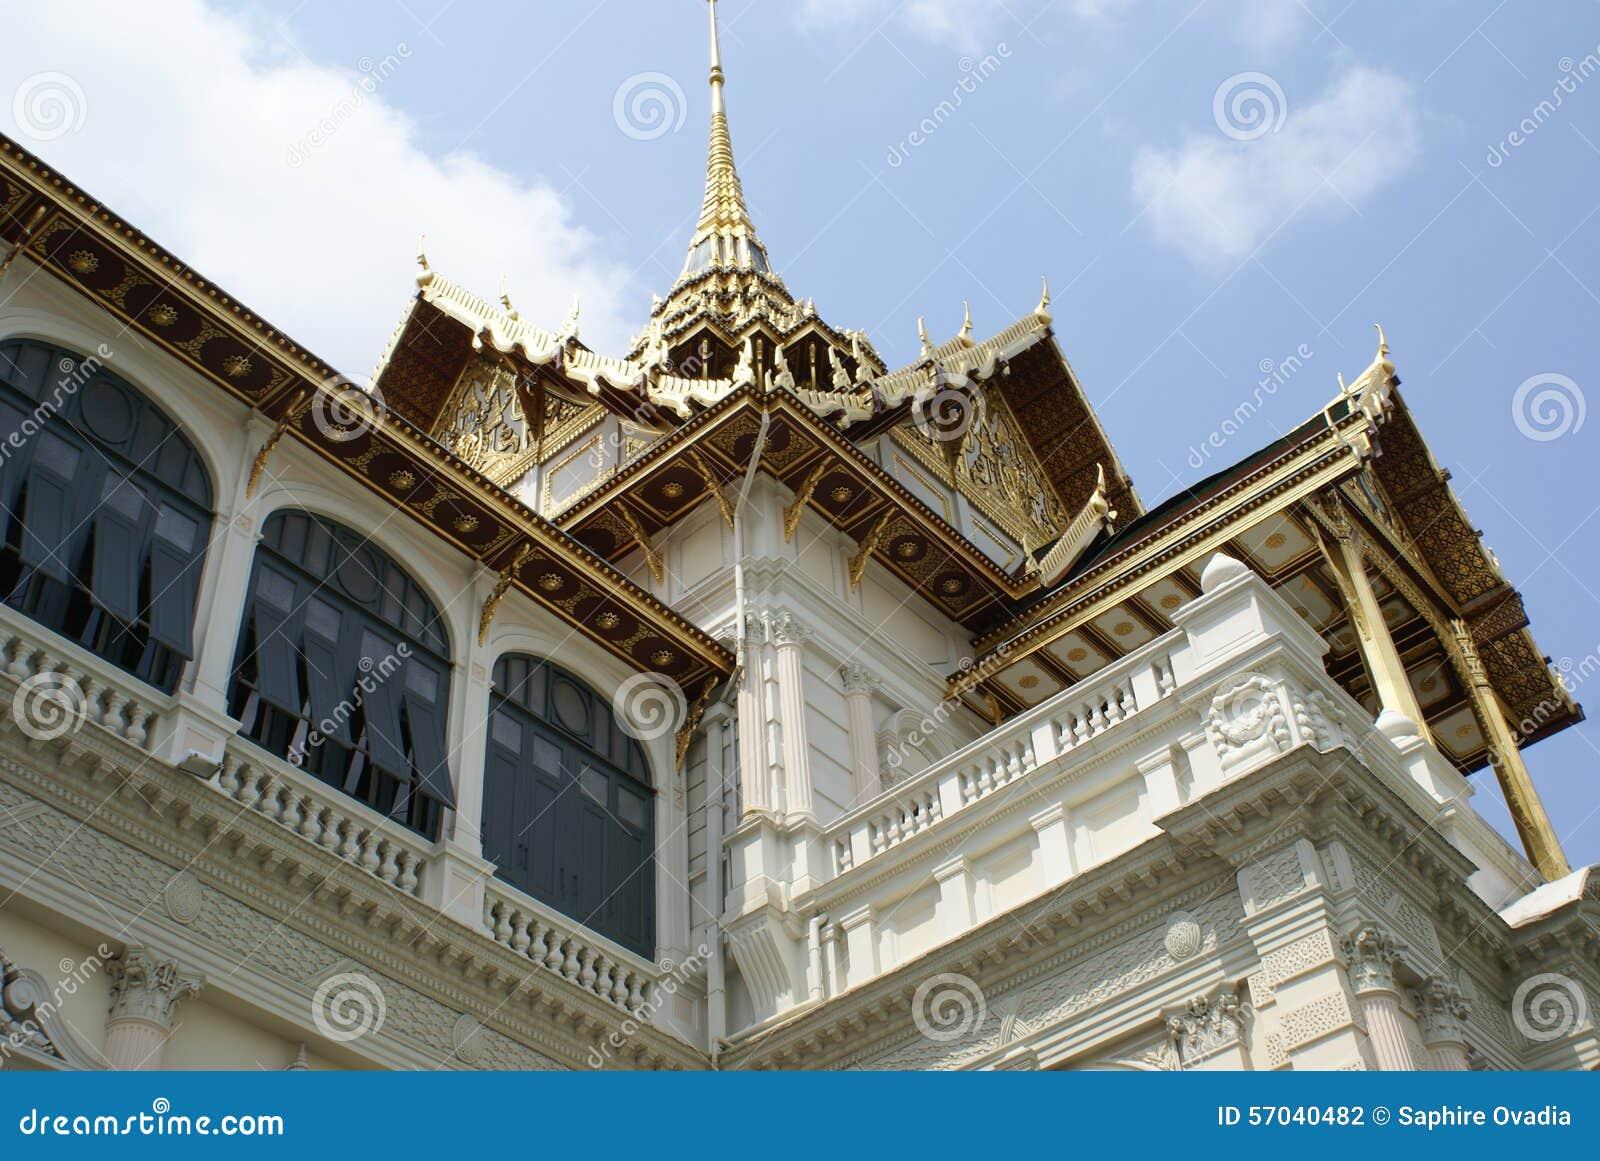 Chakri Maha Prasat In The Grand Palace, Bangkok, Thailand ...